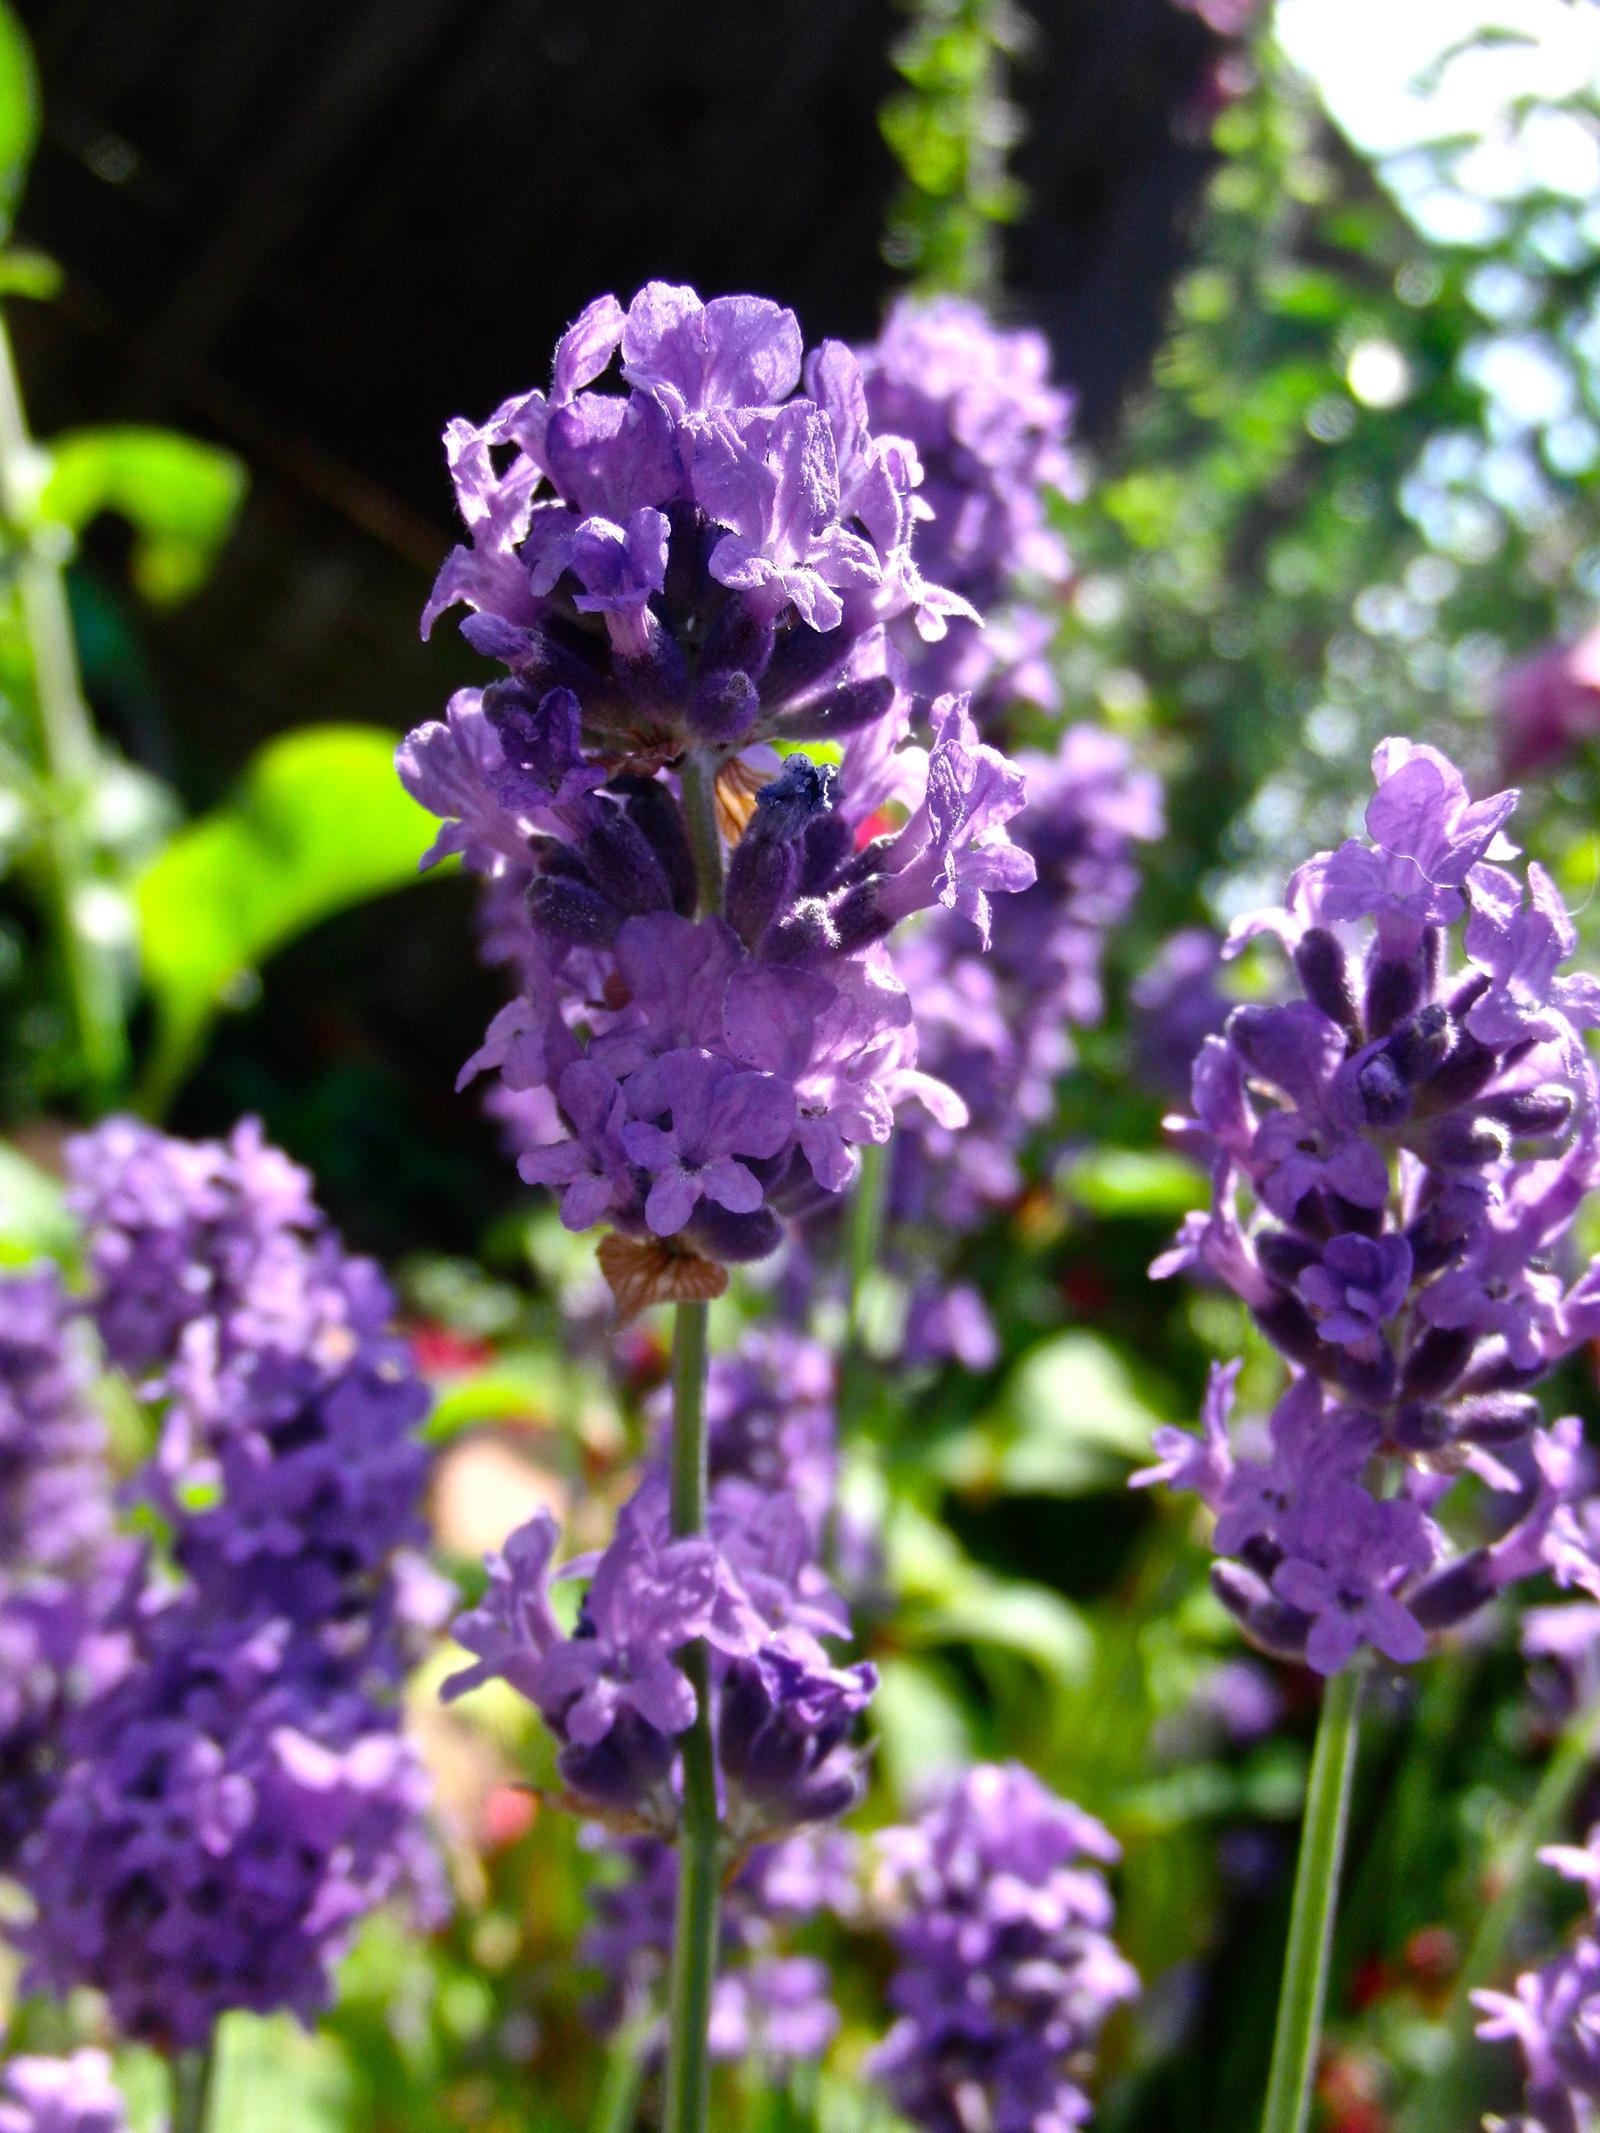 Lavender by KateHodges